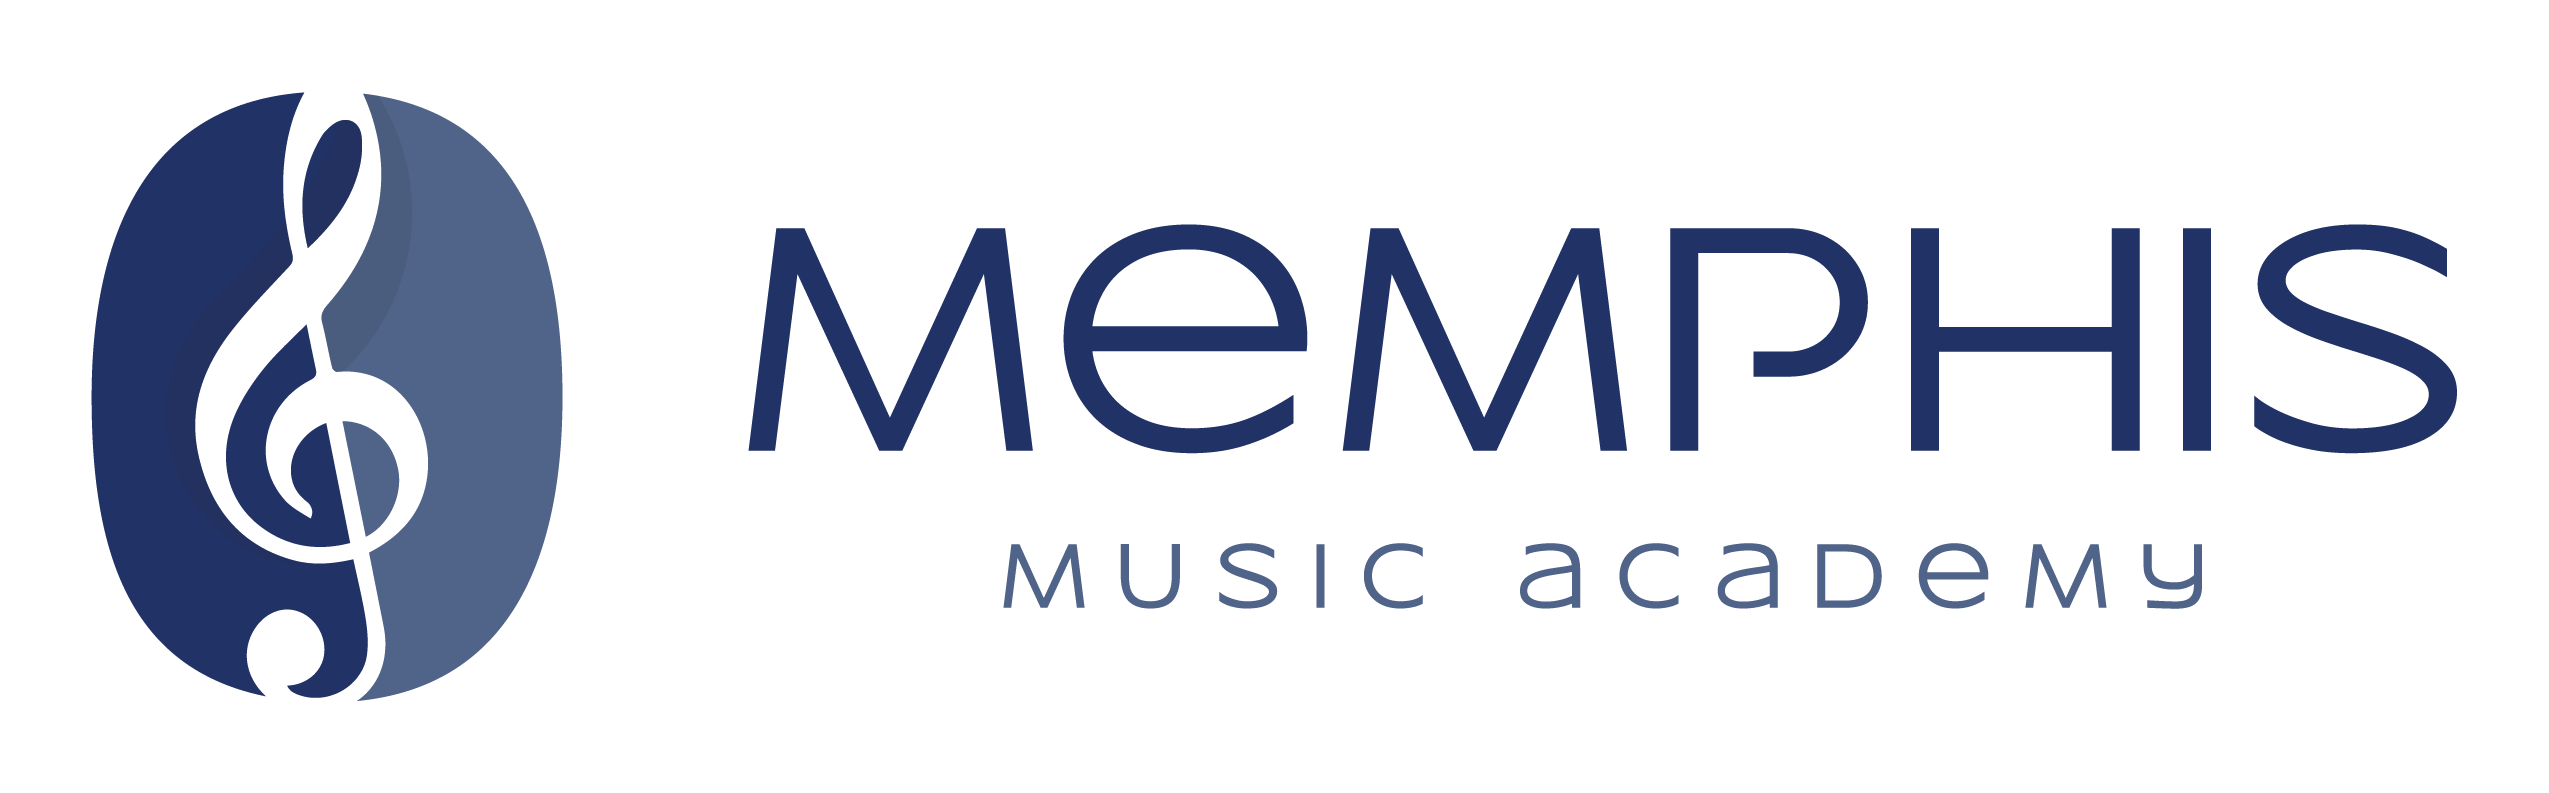 Memphis Music Academy logo